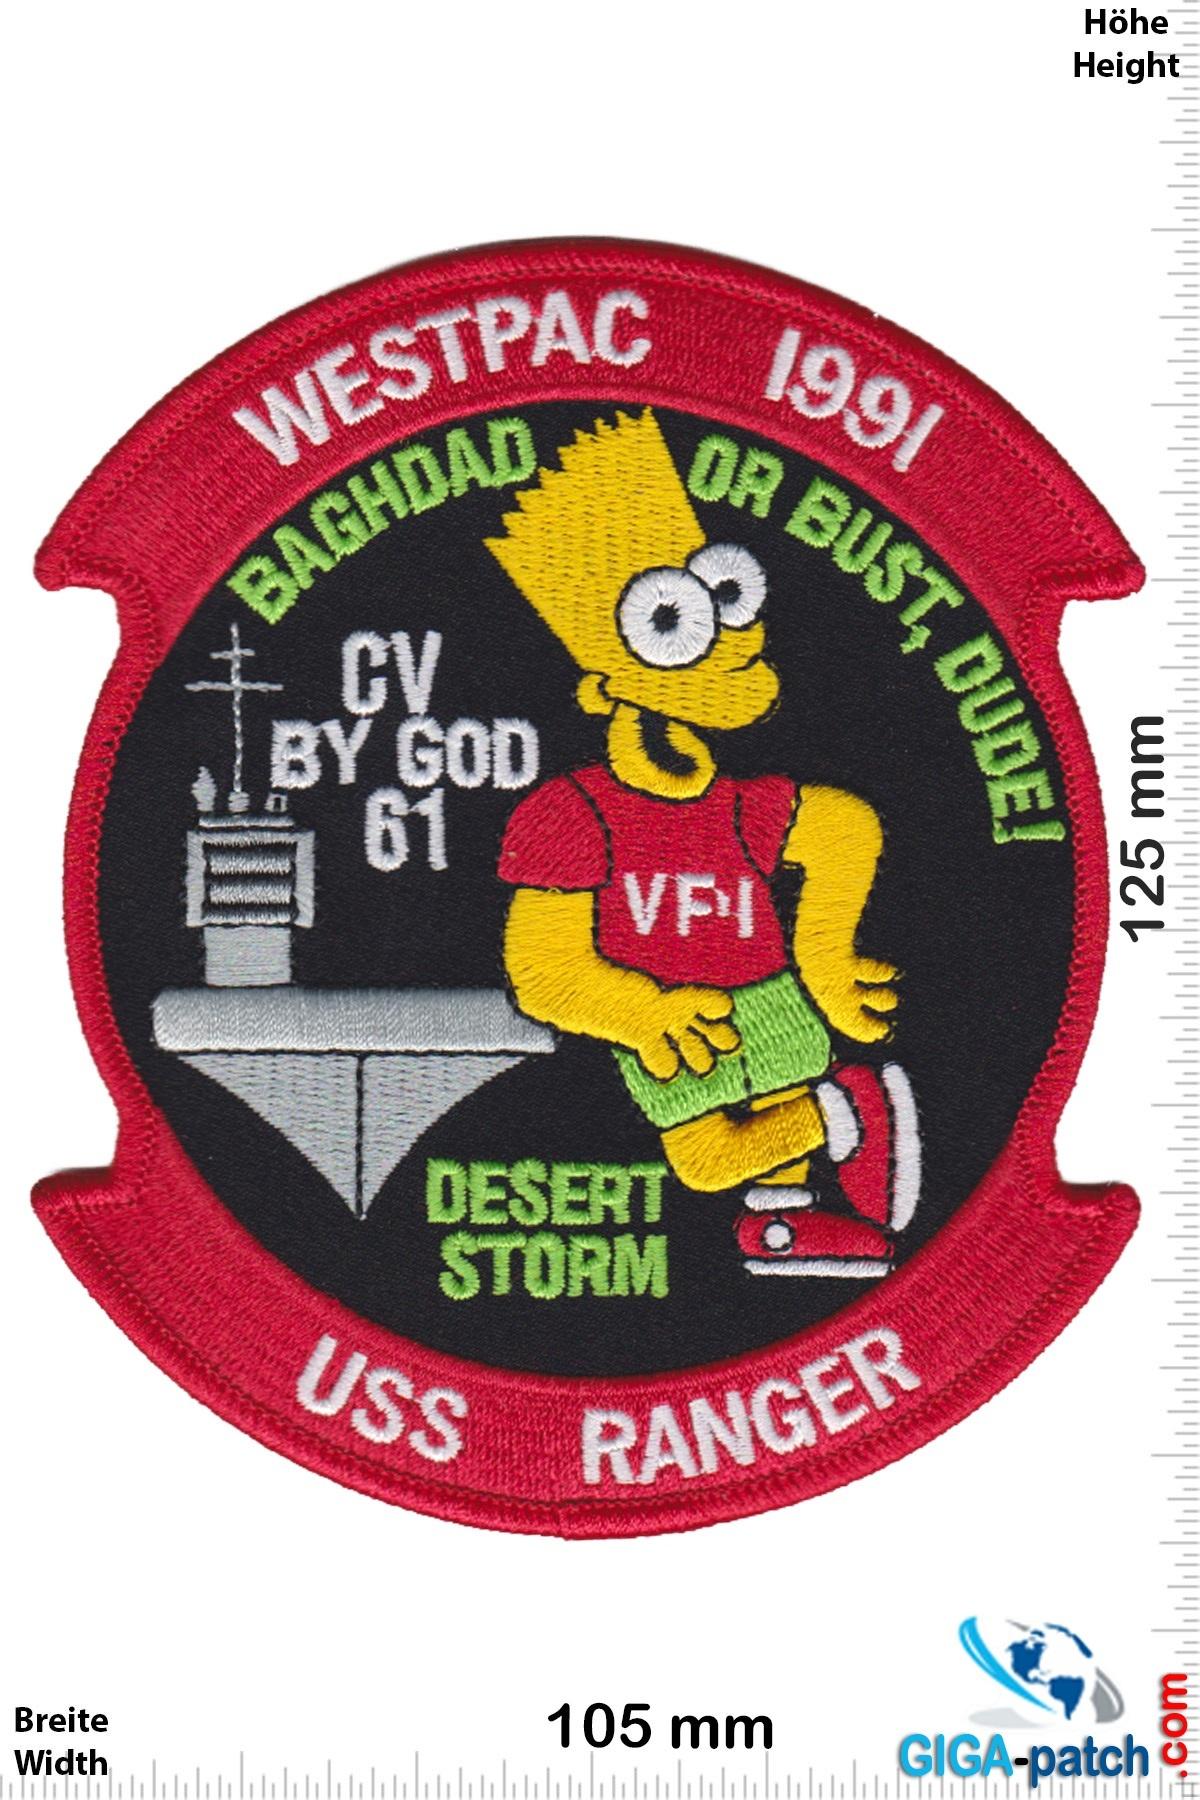 U.S. Navy CV-61 USS RANGER - BART SIMPSON WESTPAC 1991 CRUISE- HQ